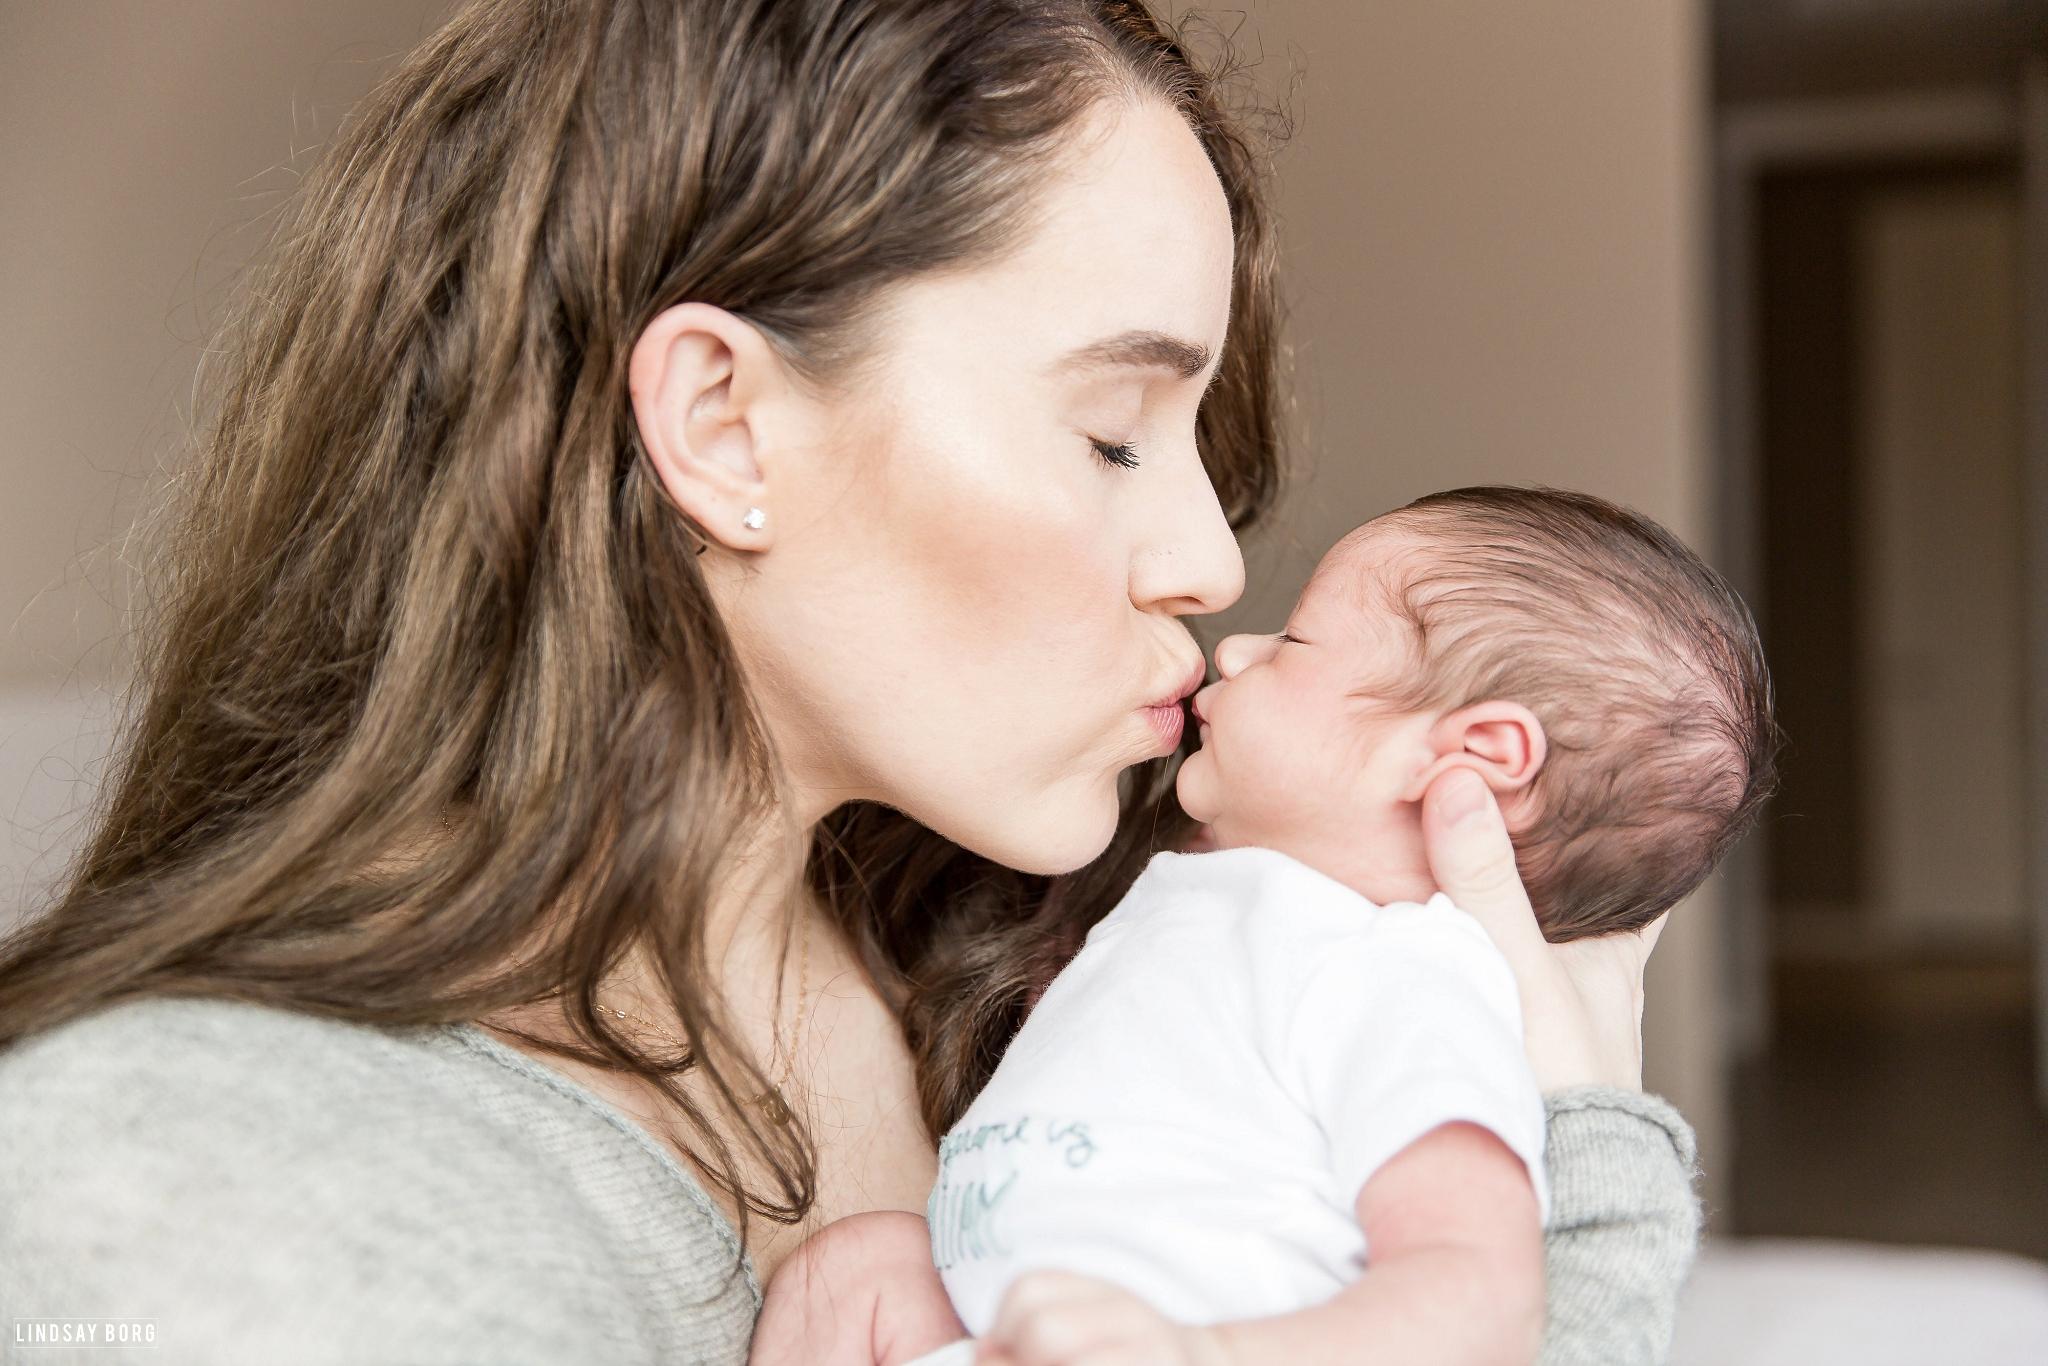 Lindsay-Borg-Photography-Arizona-newborn-family-photographer (8).jpg